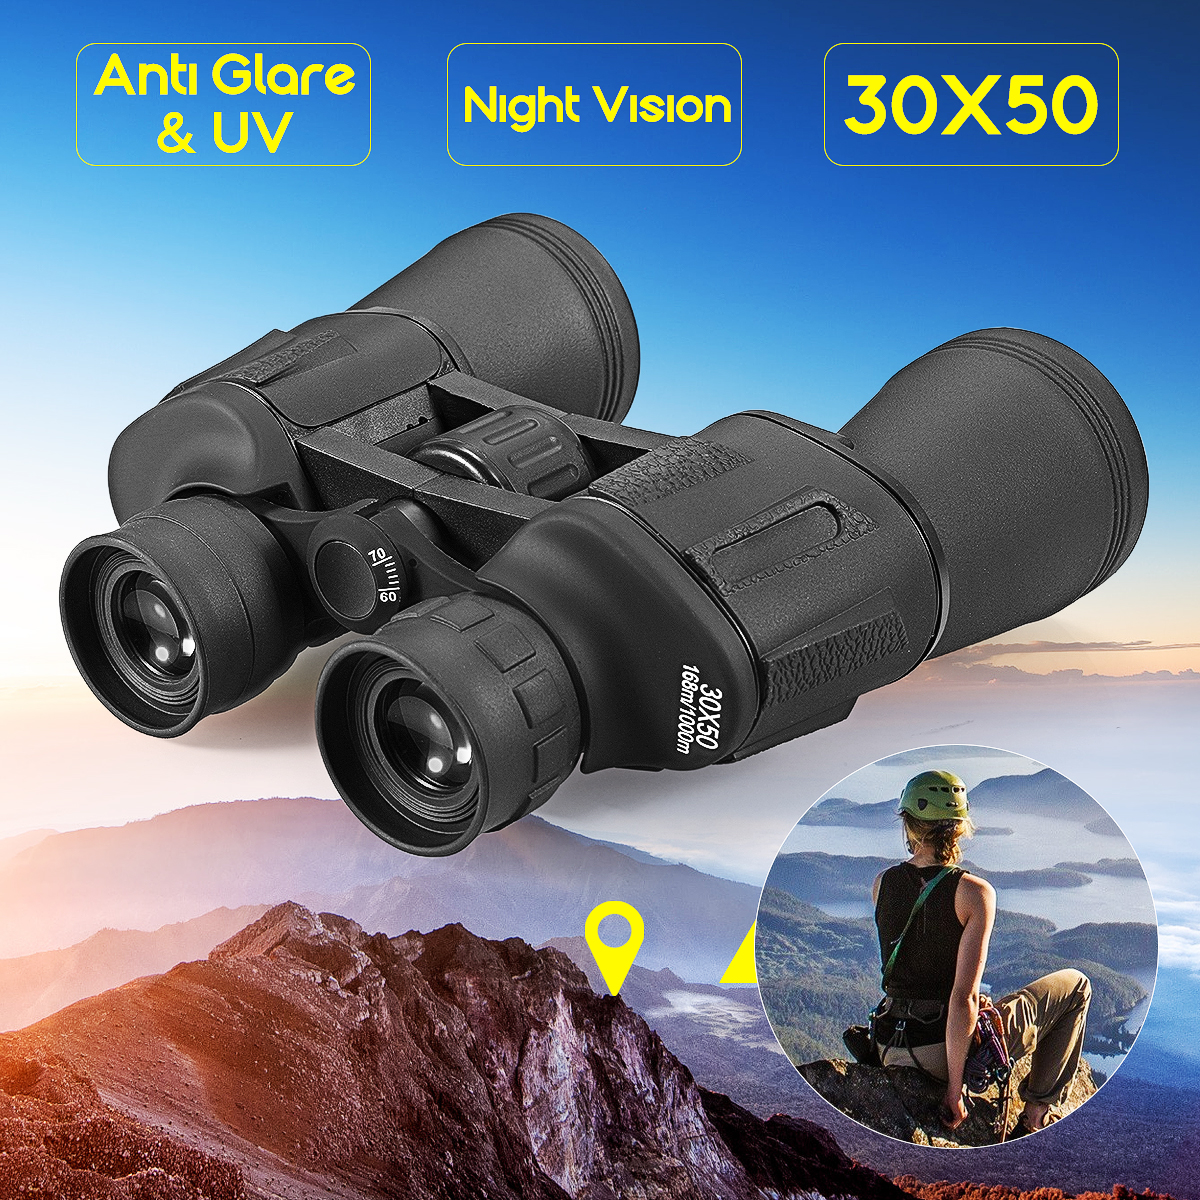 SGODDE 30x50 Optical Telescope Night Vision Binoculars 5-1000M Powerful Optics Binoculars HD Hunting Camping стоимость